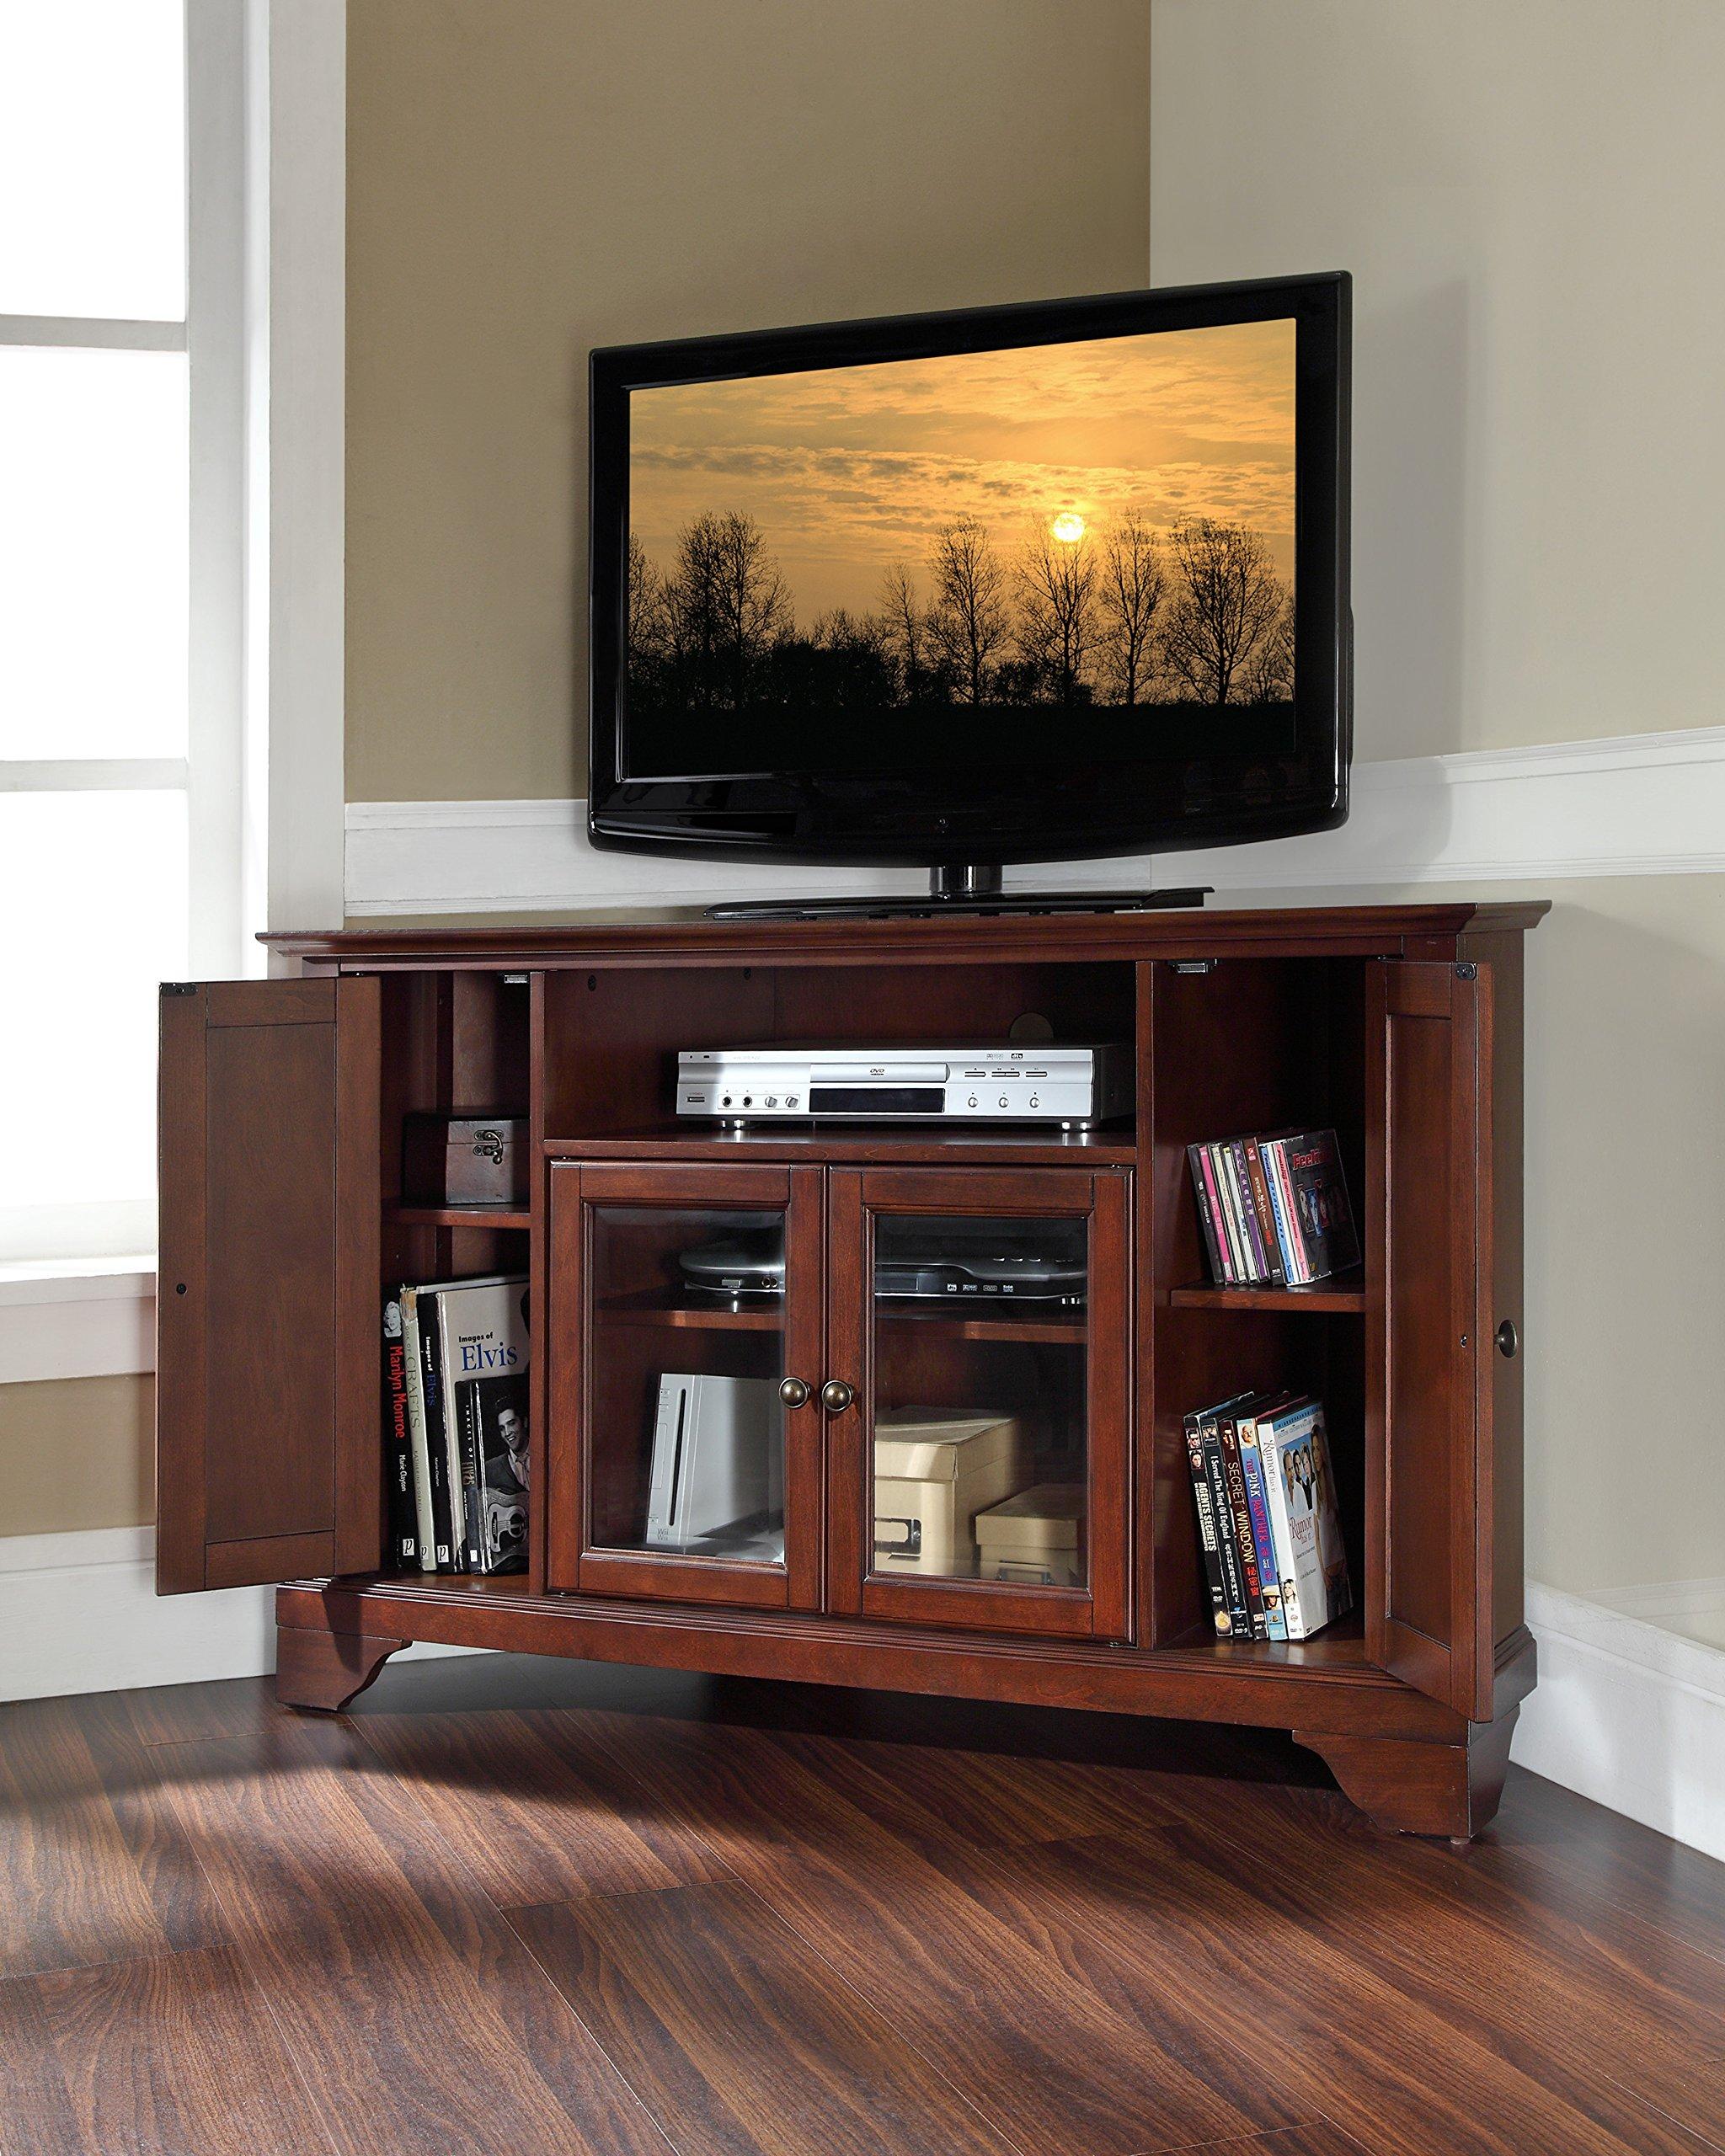 Crosley Furniture LaFayette 48-inch Corner TV Stand - Vintage Mahogany by Crosley Furniture